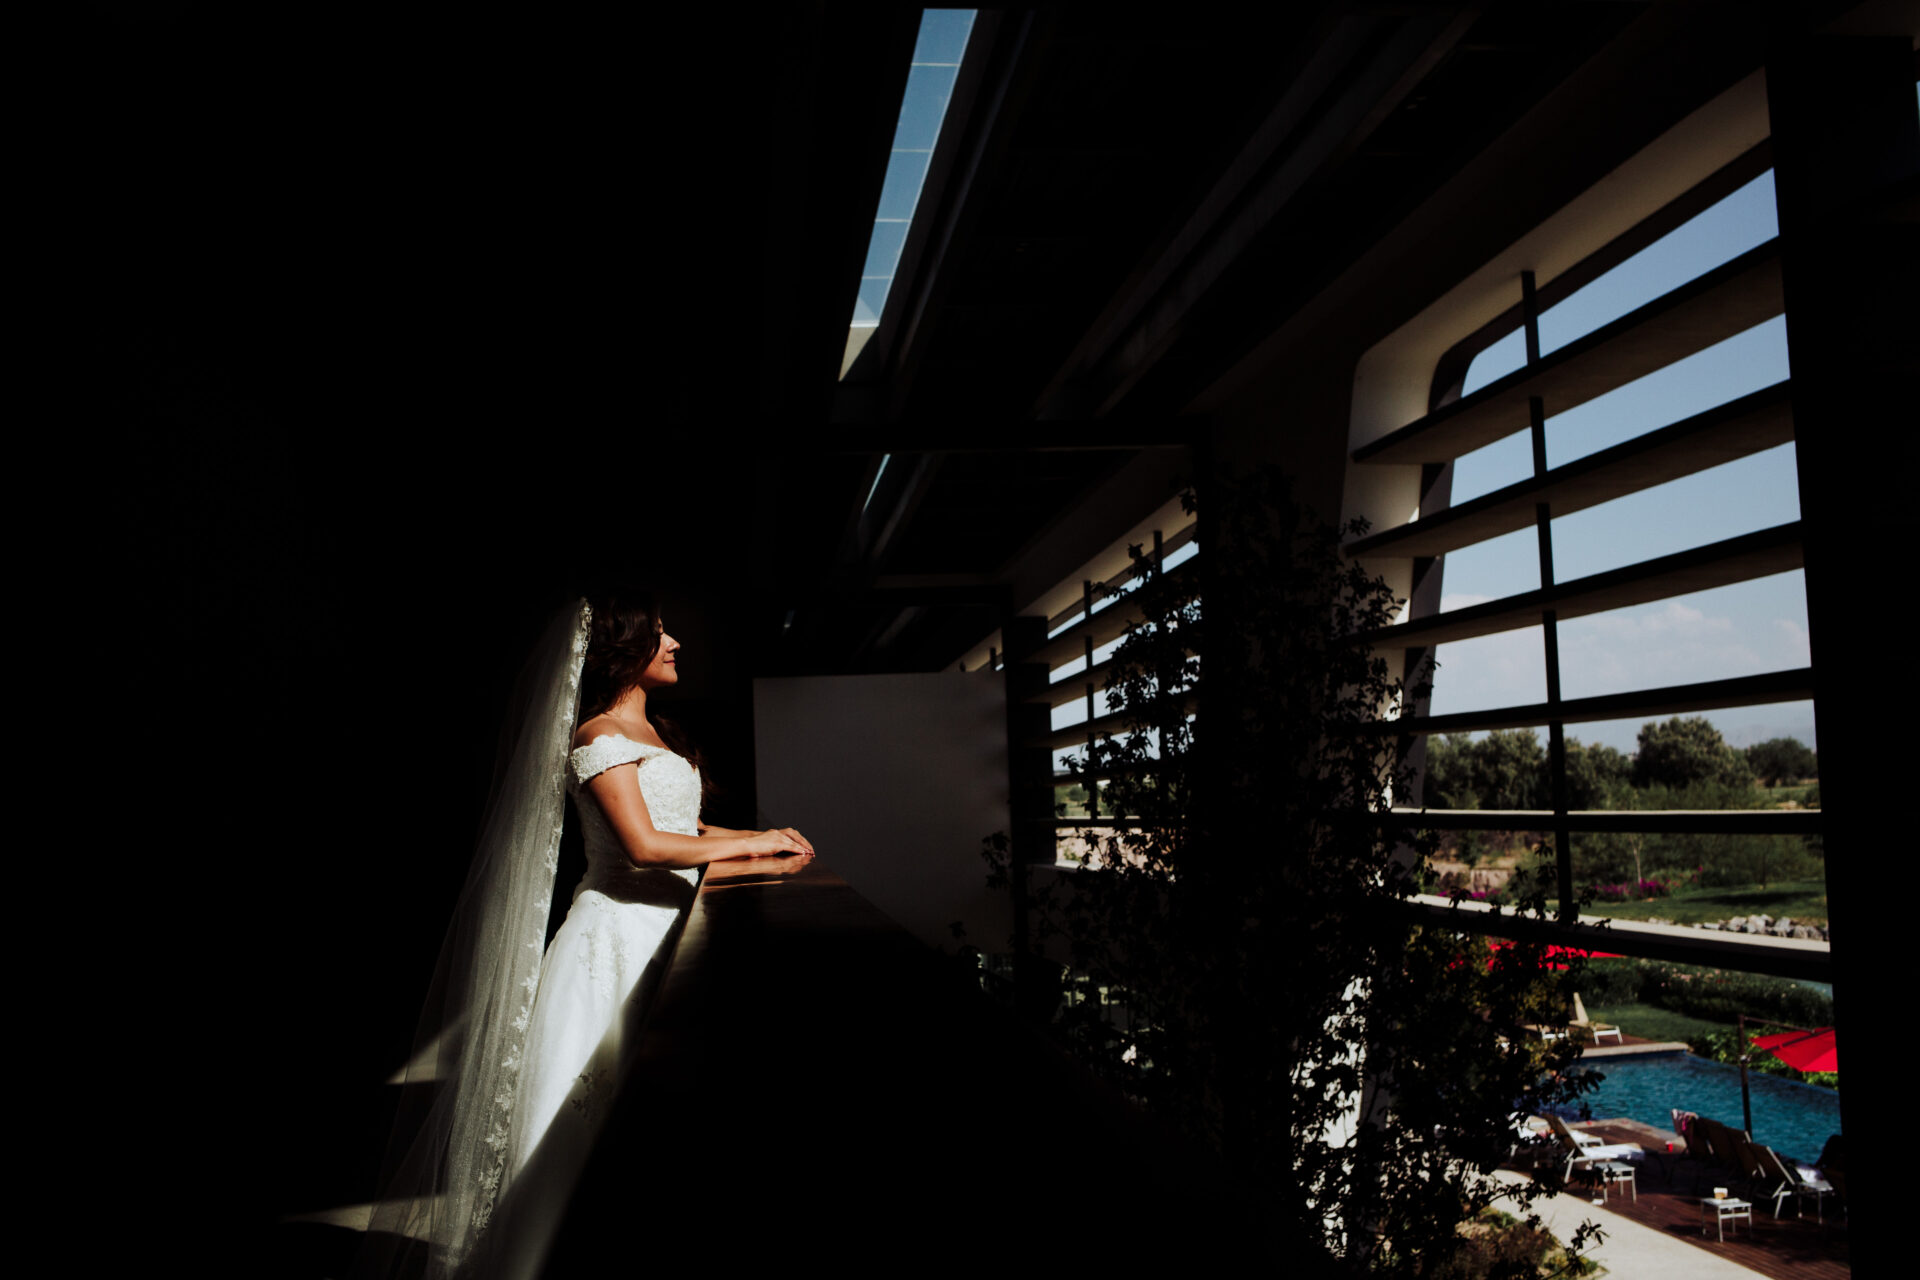 javier_noriega_fotografo_bodas_torreon_coahuila_zacatecas_wedding_photographer21a